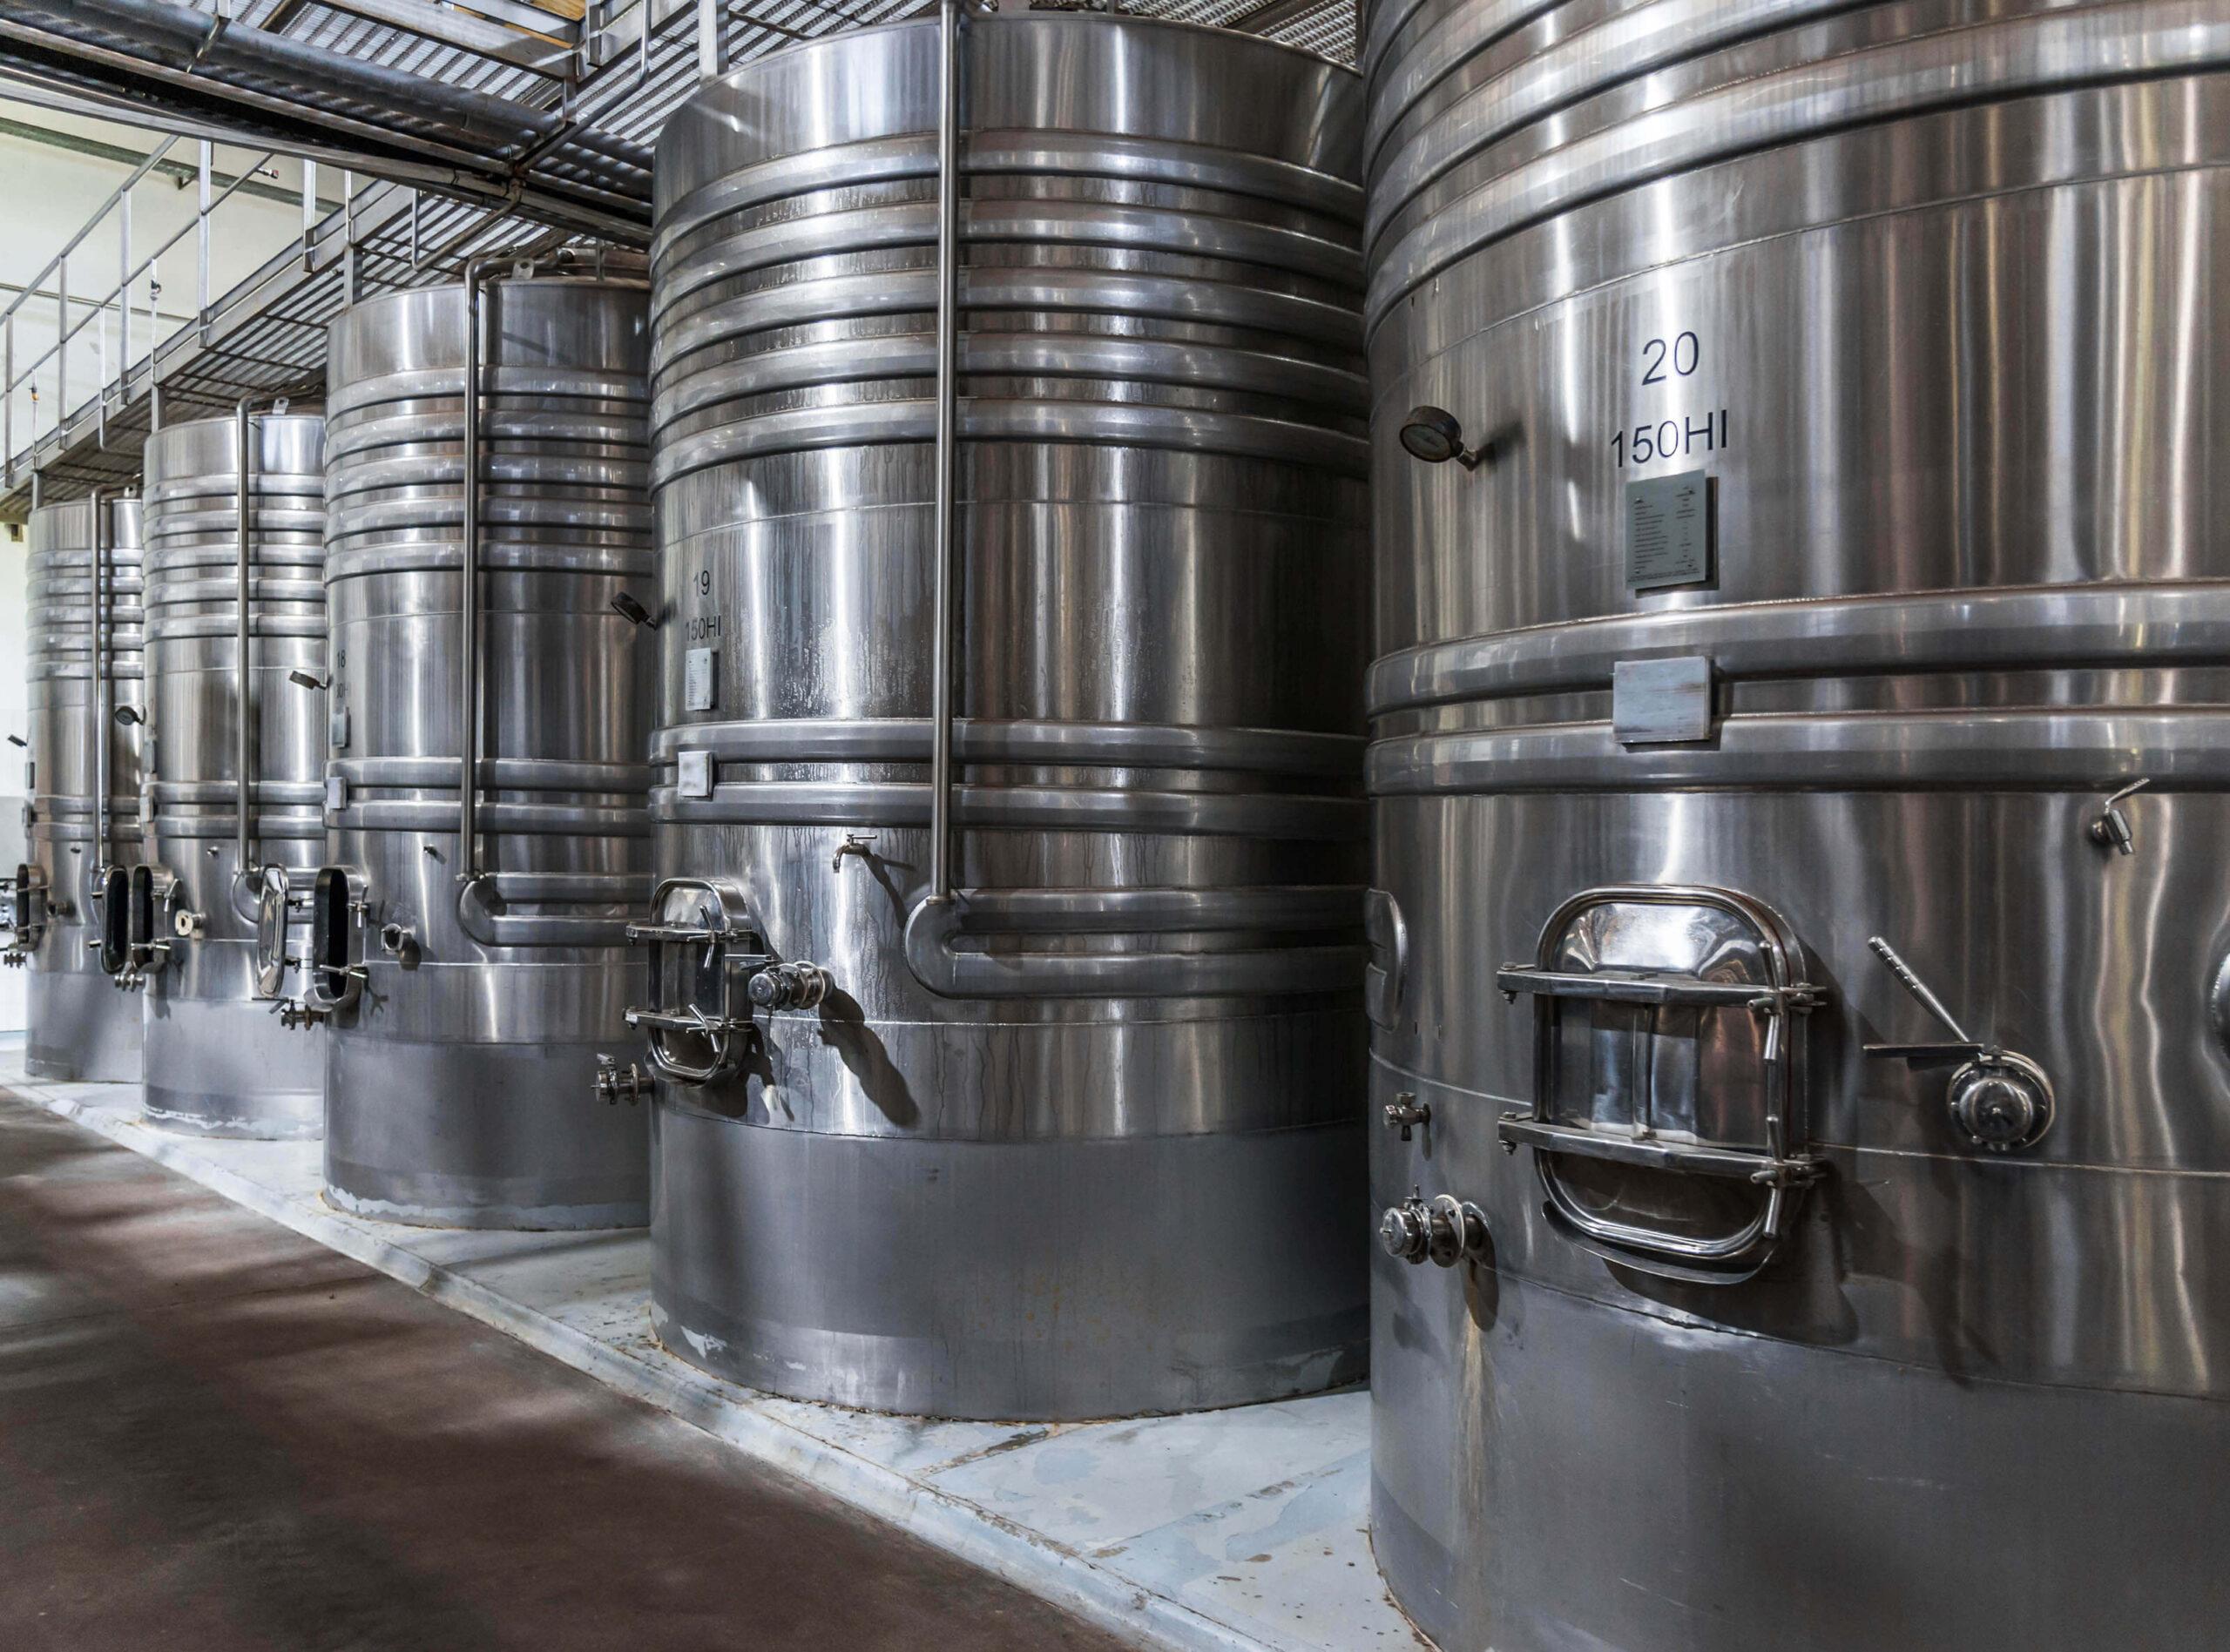 Creeds Fermentation Tanks